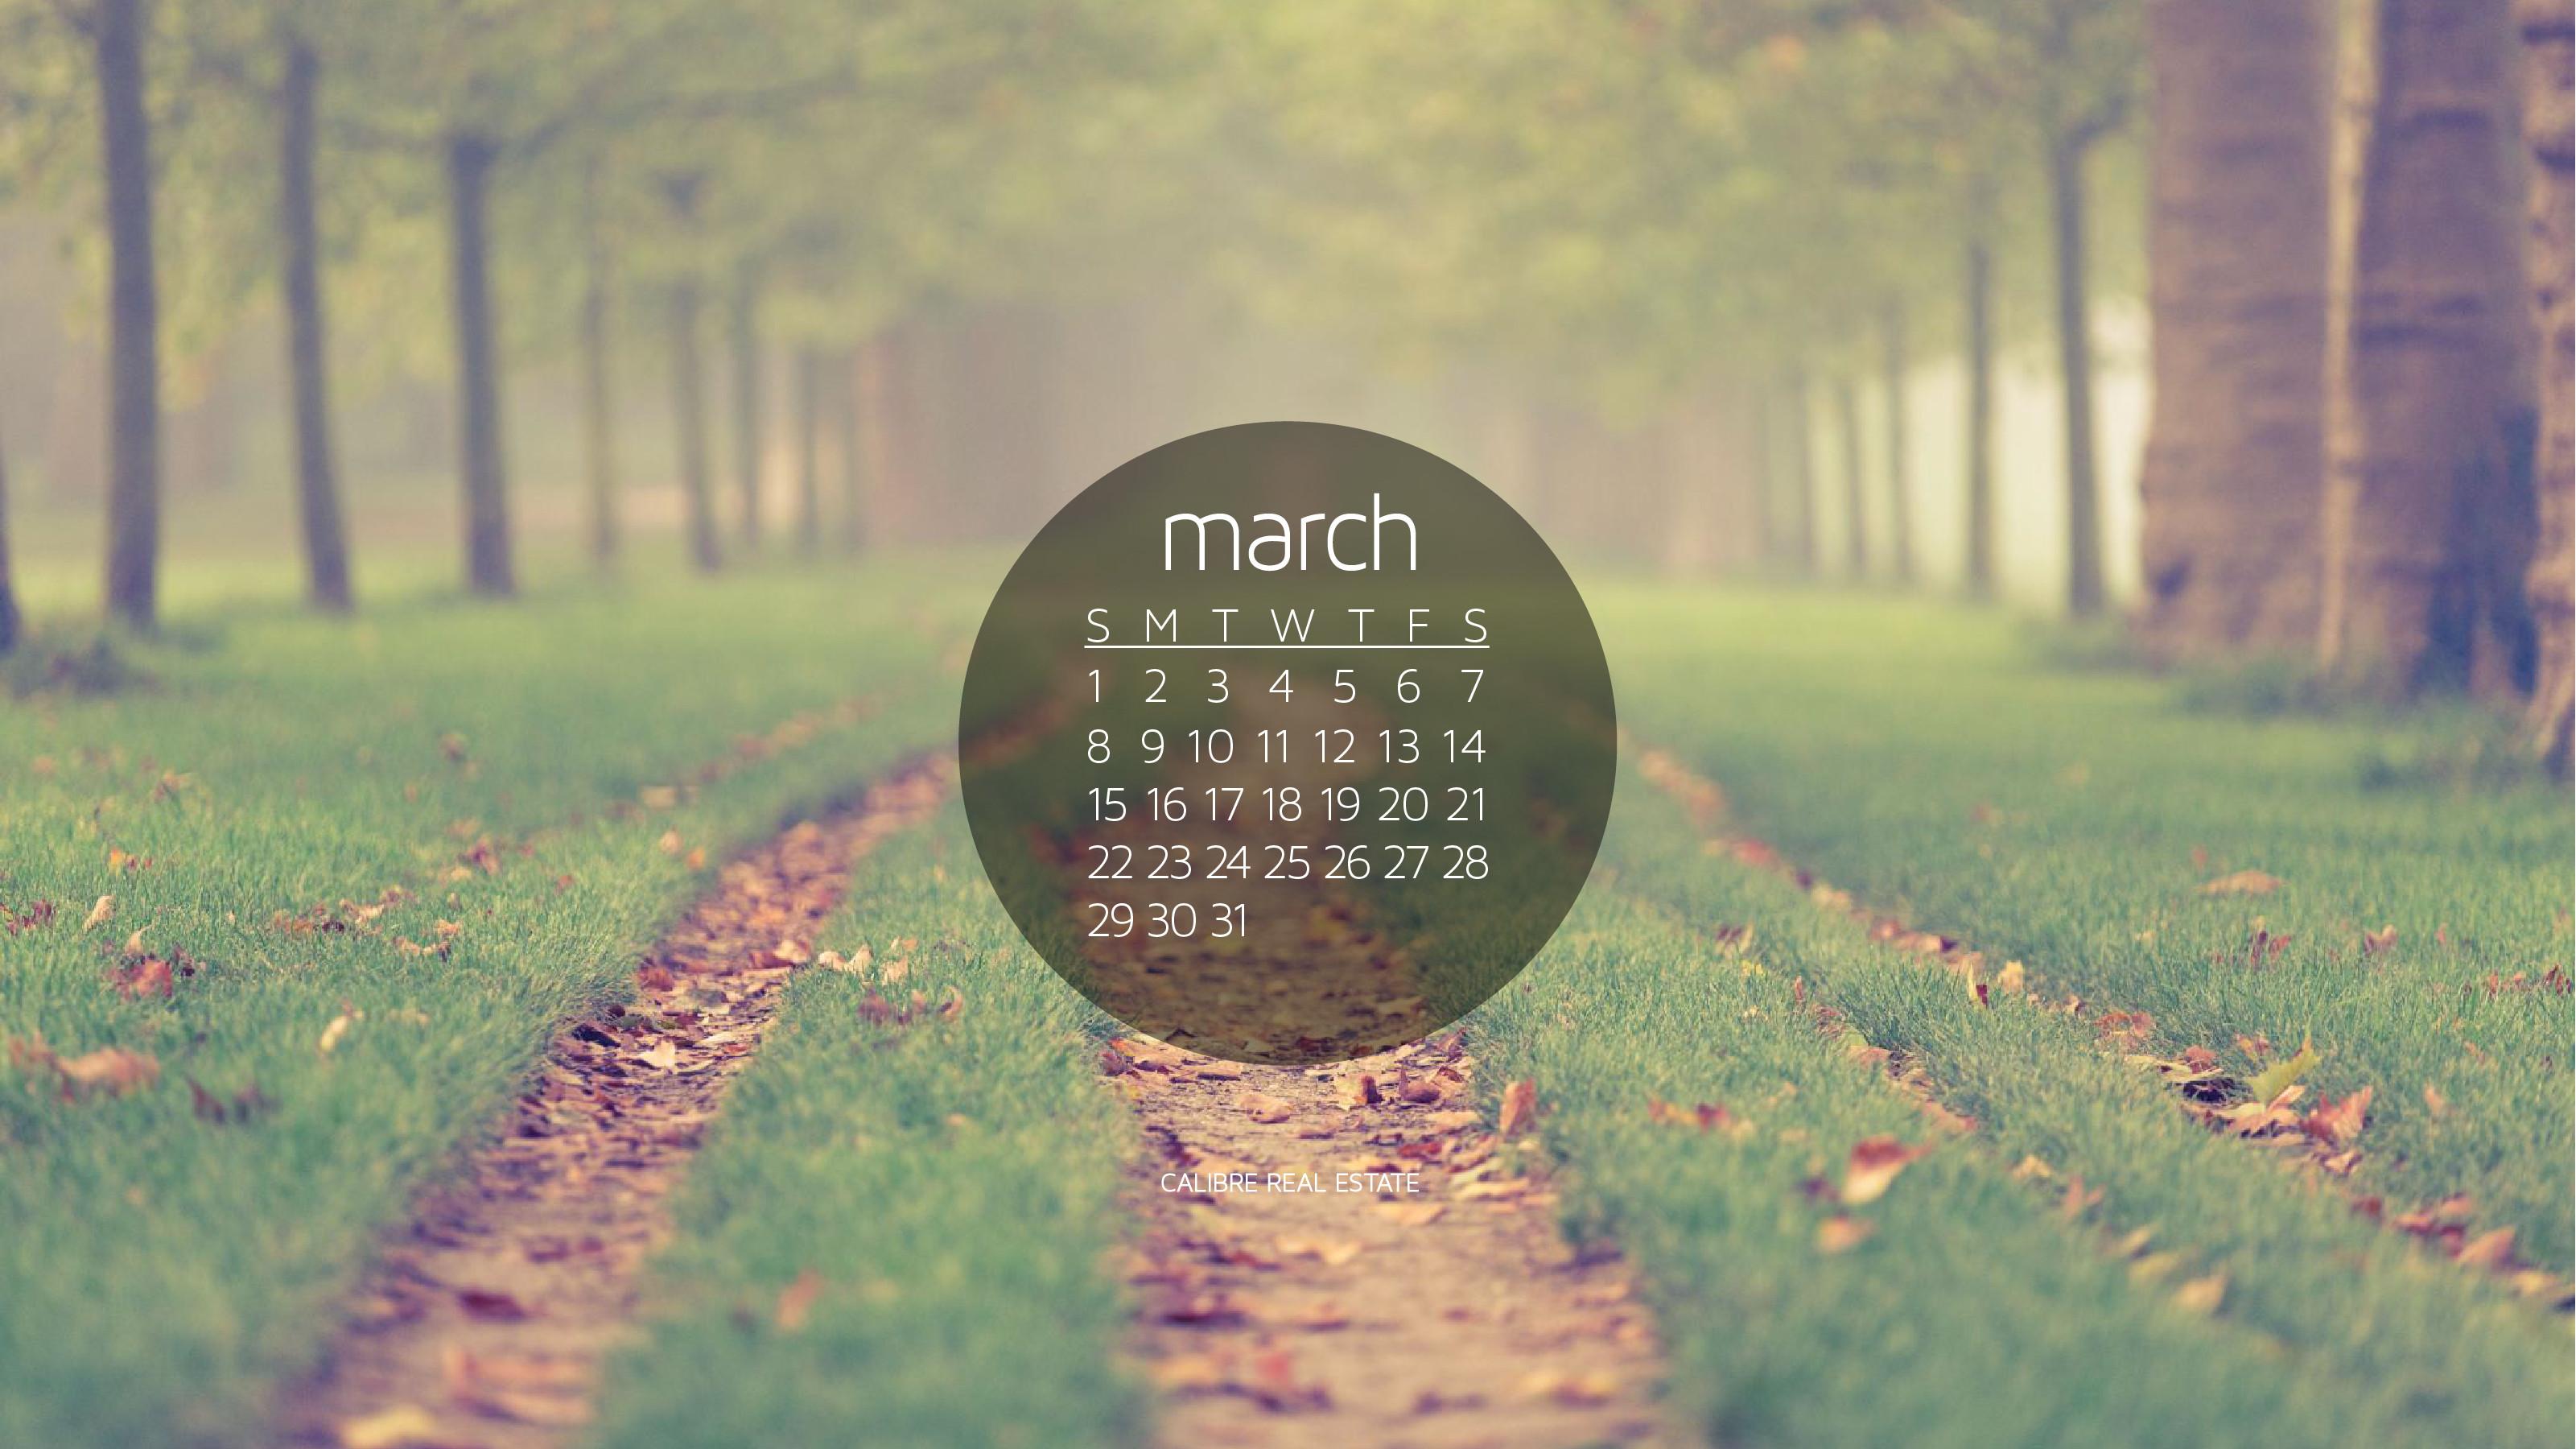 Res: 3201x1800, March 2015 Calendar Wallpaper for Desktop